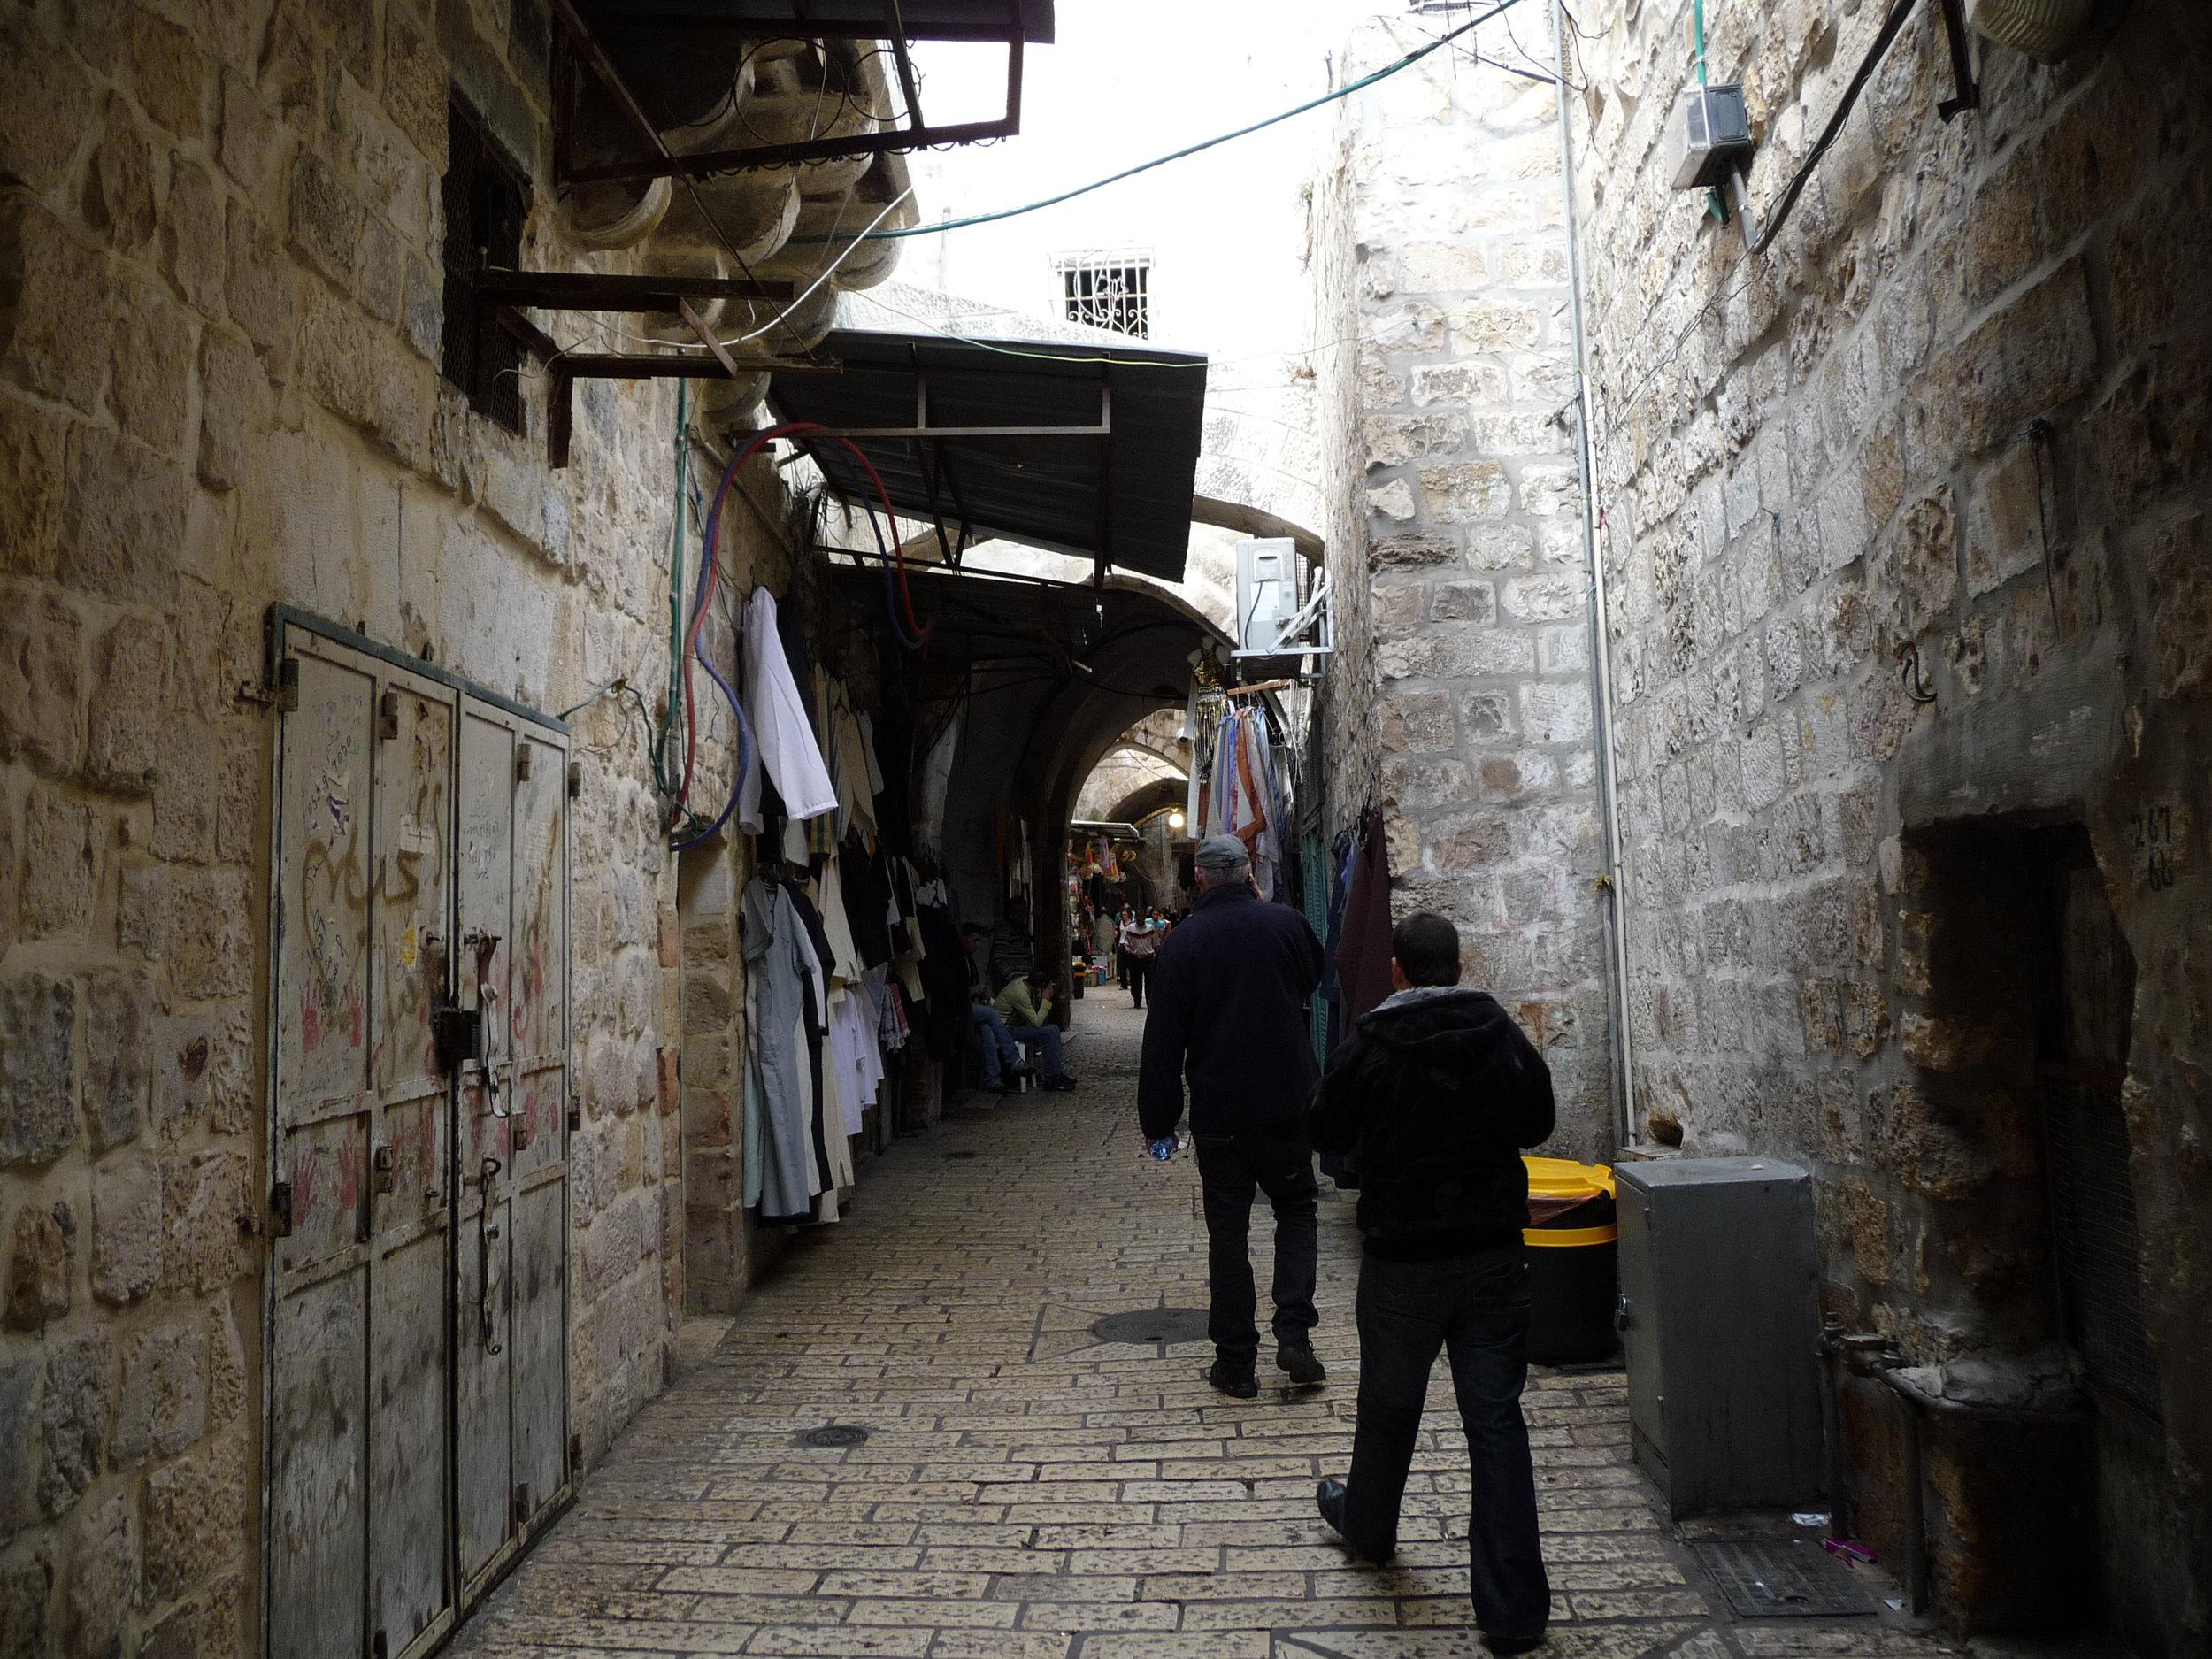 Street in old city.JPG